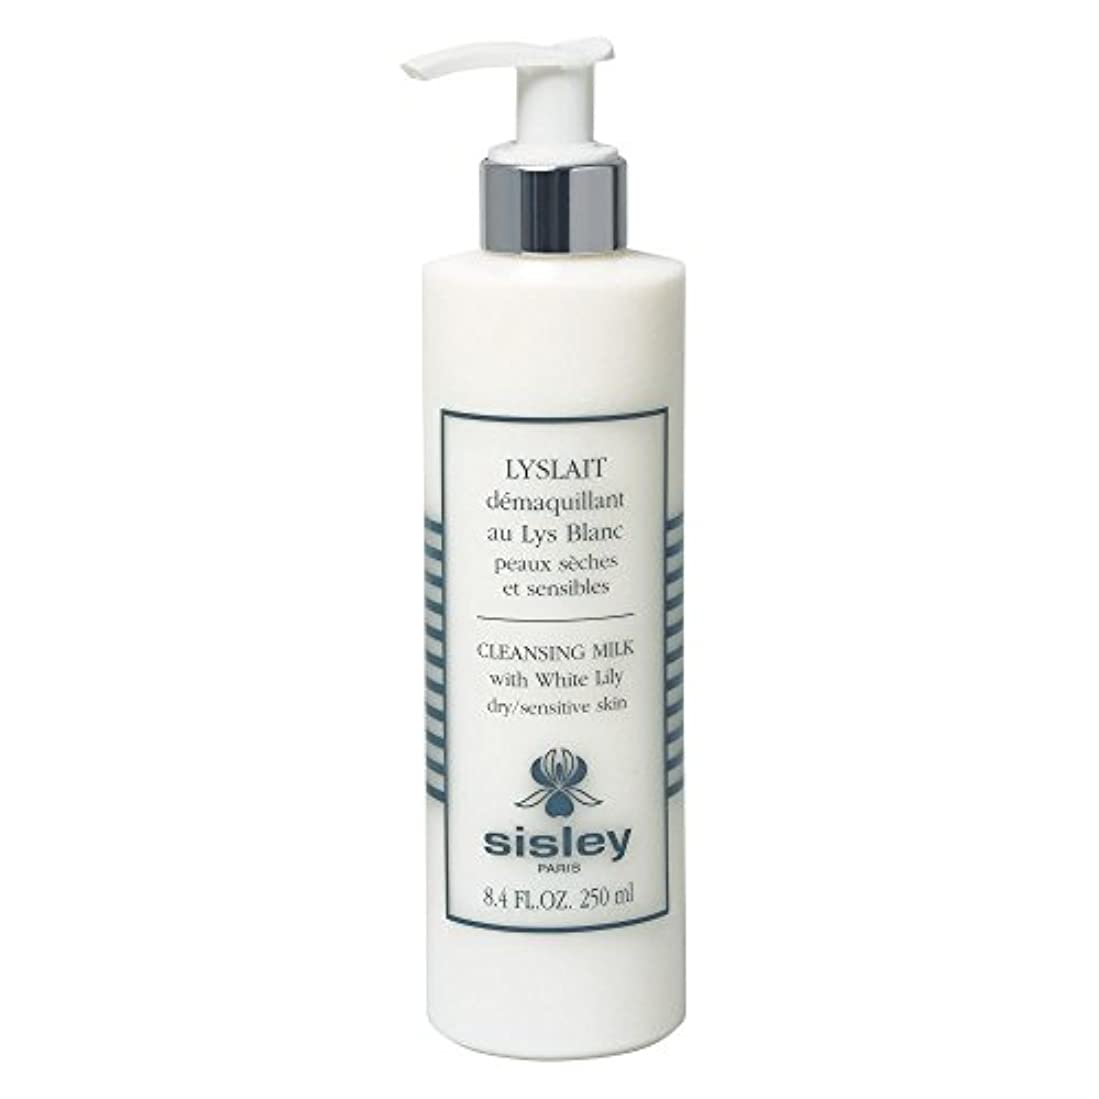 [Sisley] シスレーは、メイクアップLyslait白ユリ、250ミリリットルでミルクを取り除きます - Sisley Lyslait Make-Up Removing Milk With White Lily, 250ml...